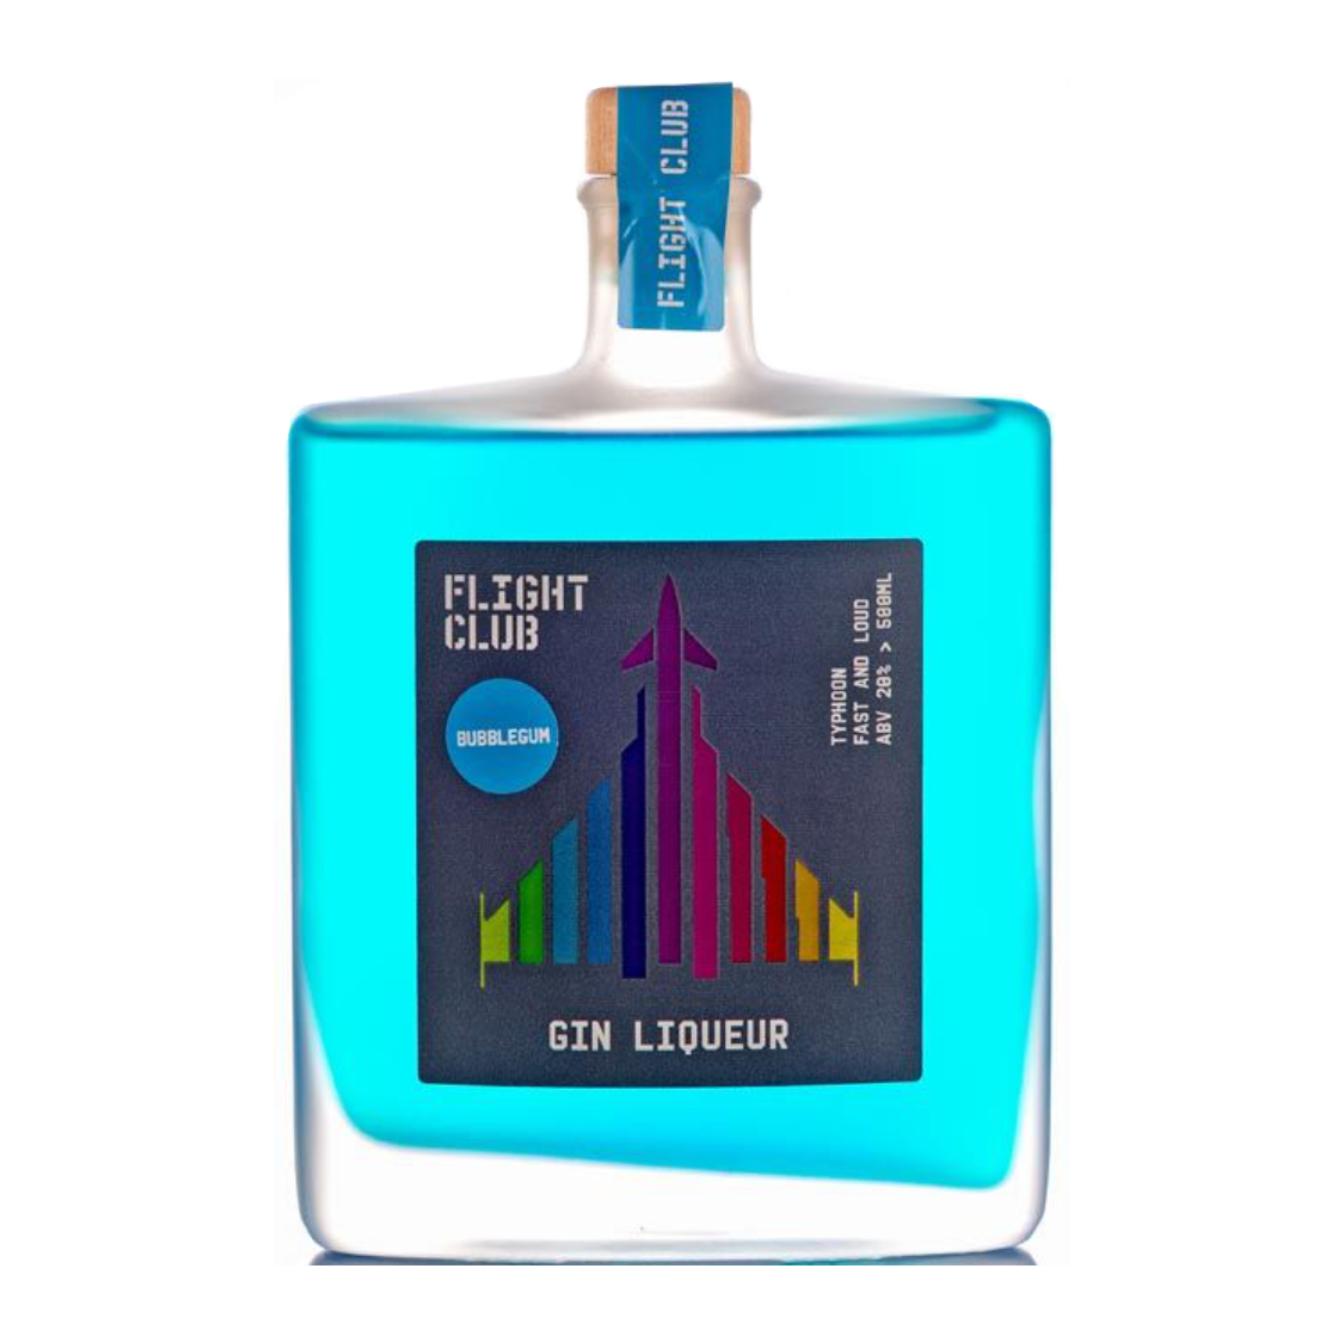 Flight Club Bubblegum Gin Liqueur